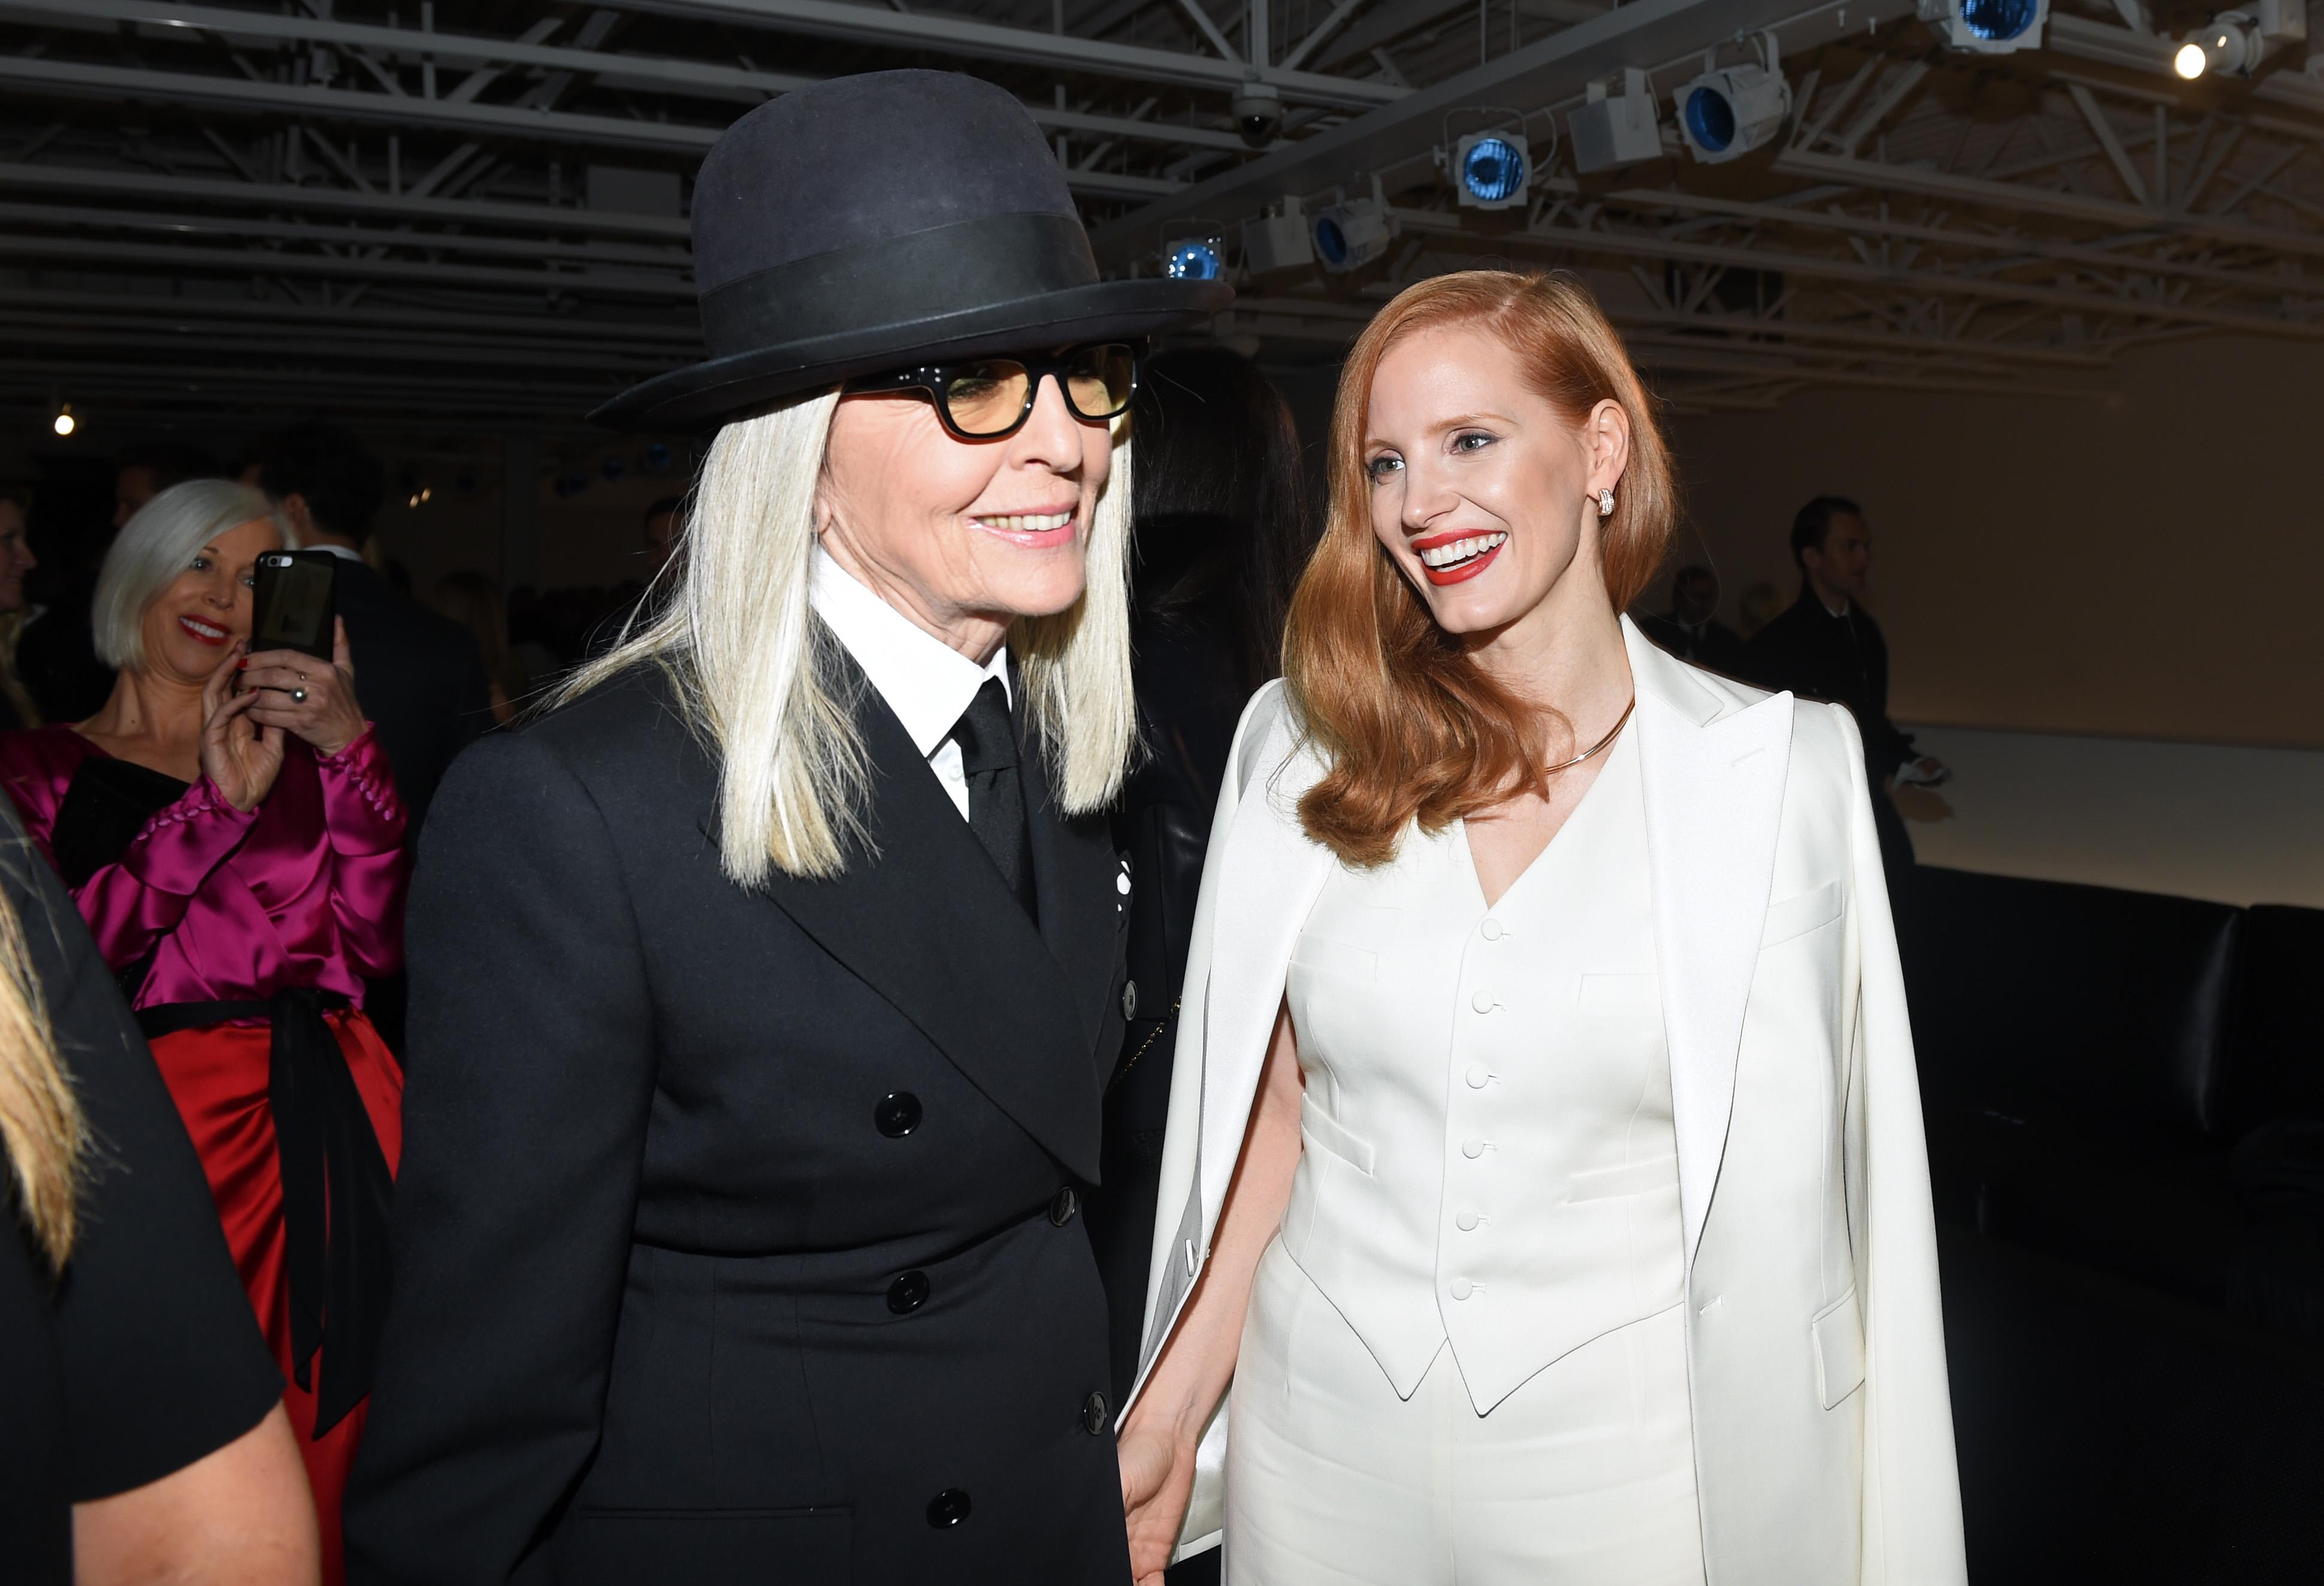 Diane Keaton and Jessica ChastainRalph Lauren show, Arrivals, Spring Summer 2018, New York Fashion Week, USA - 12 Sep 2017